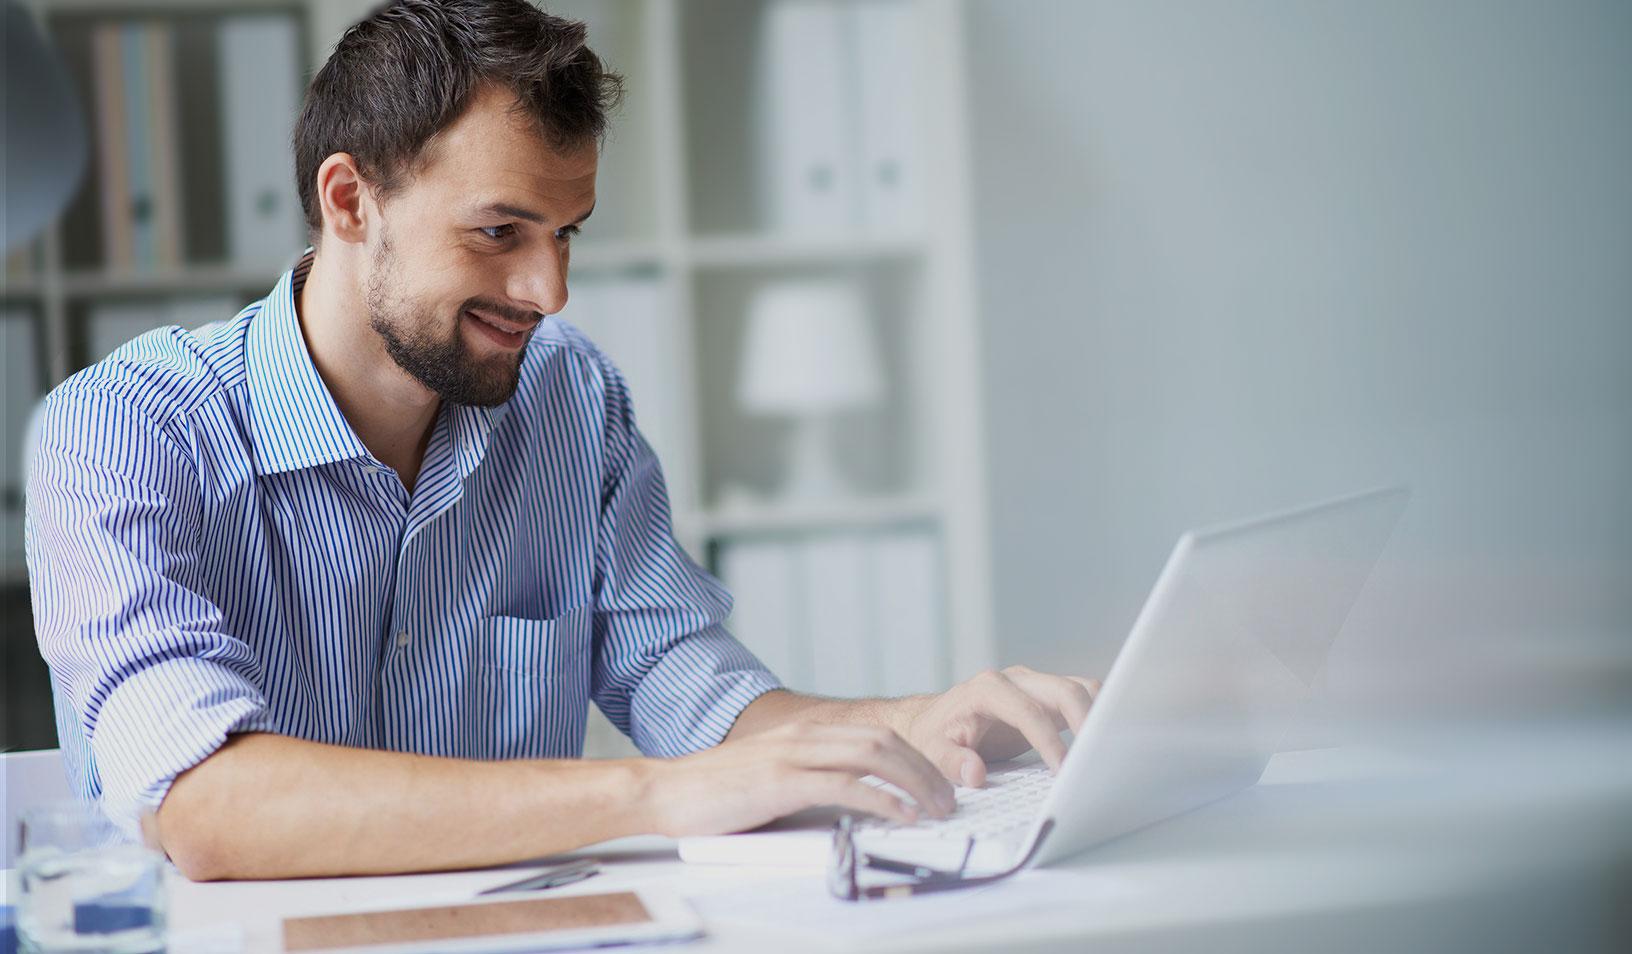 Man at computer working